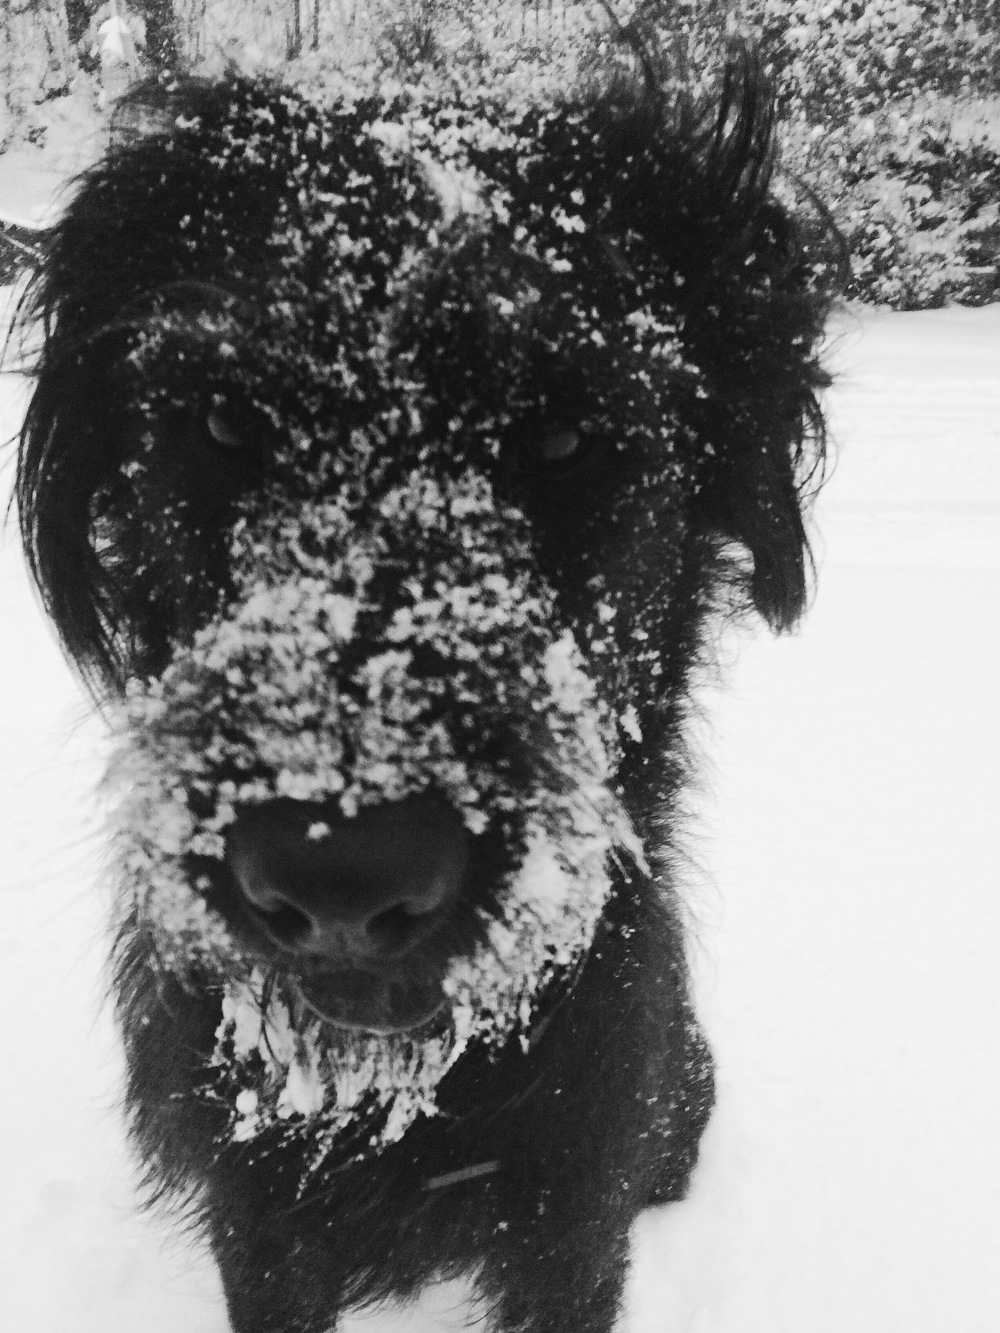 #snowbeard